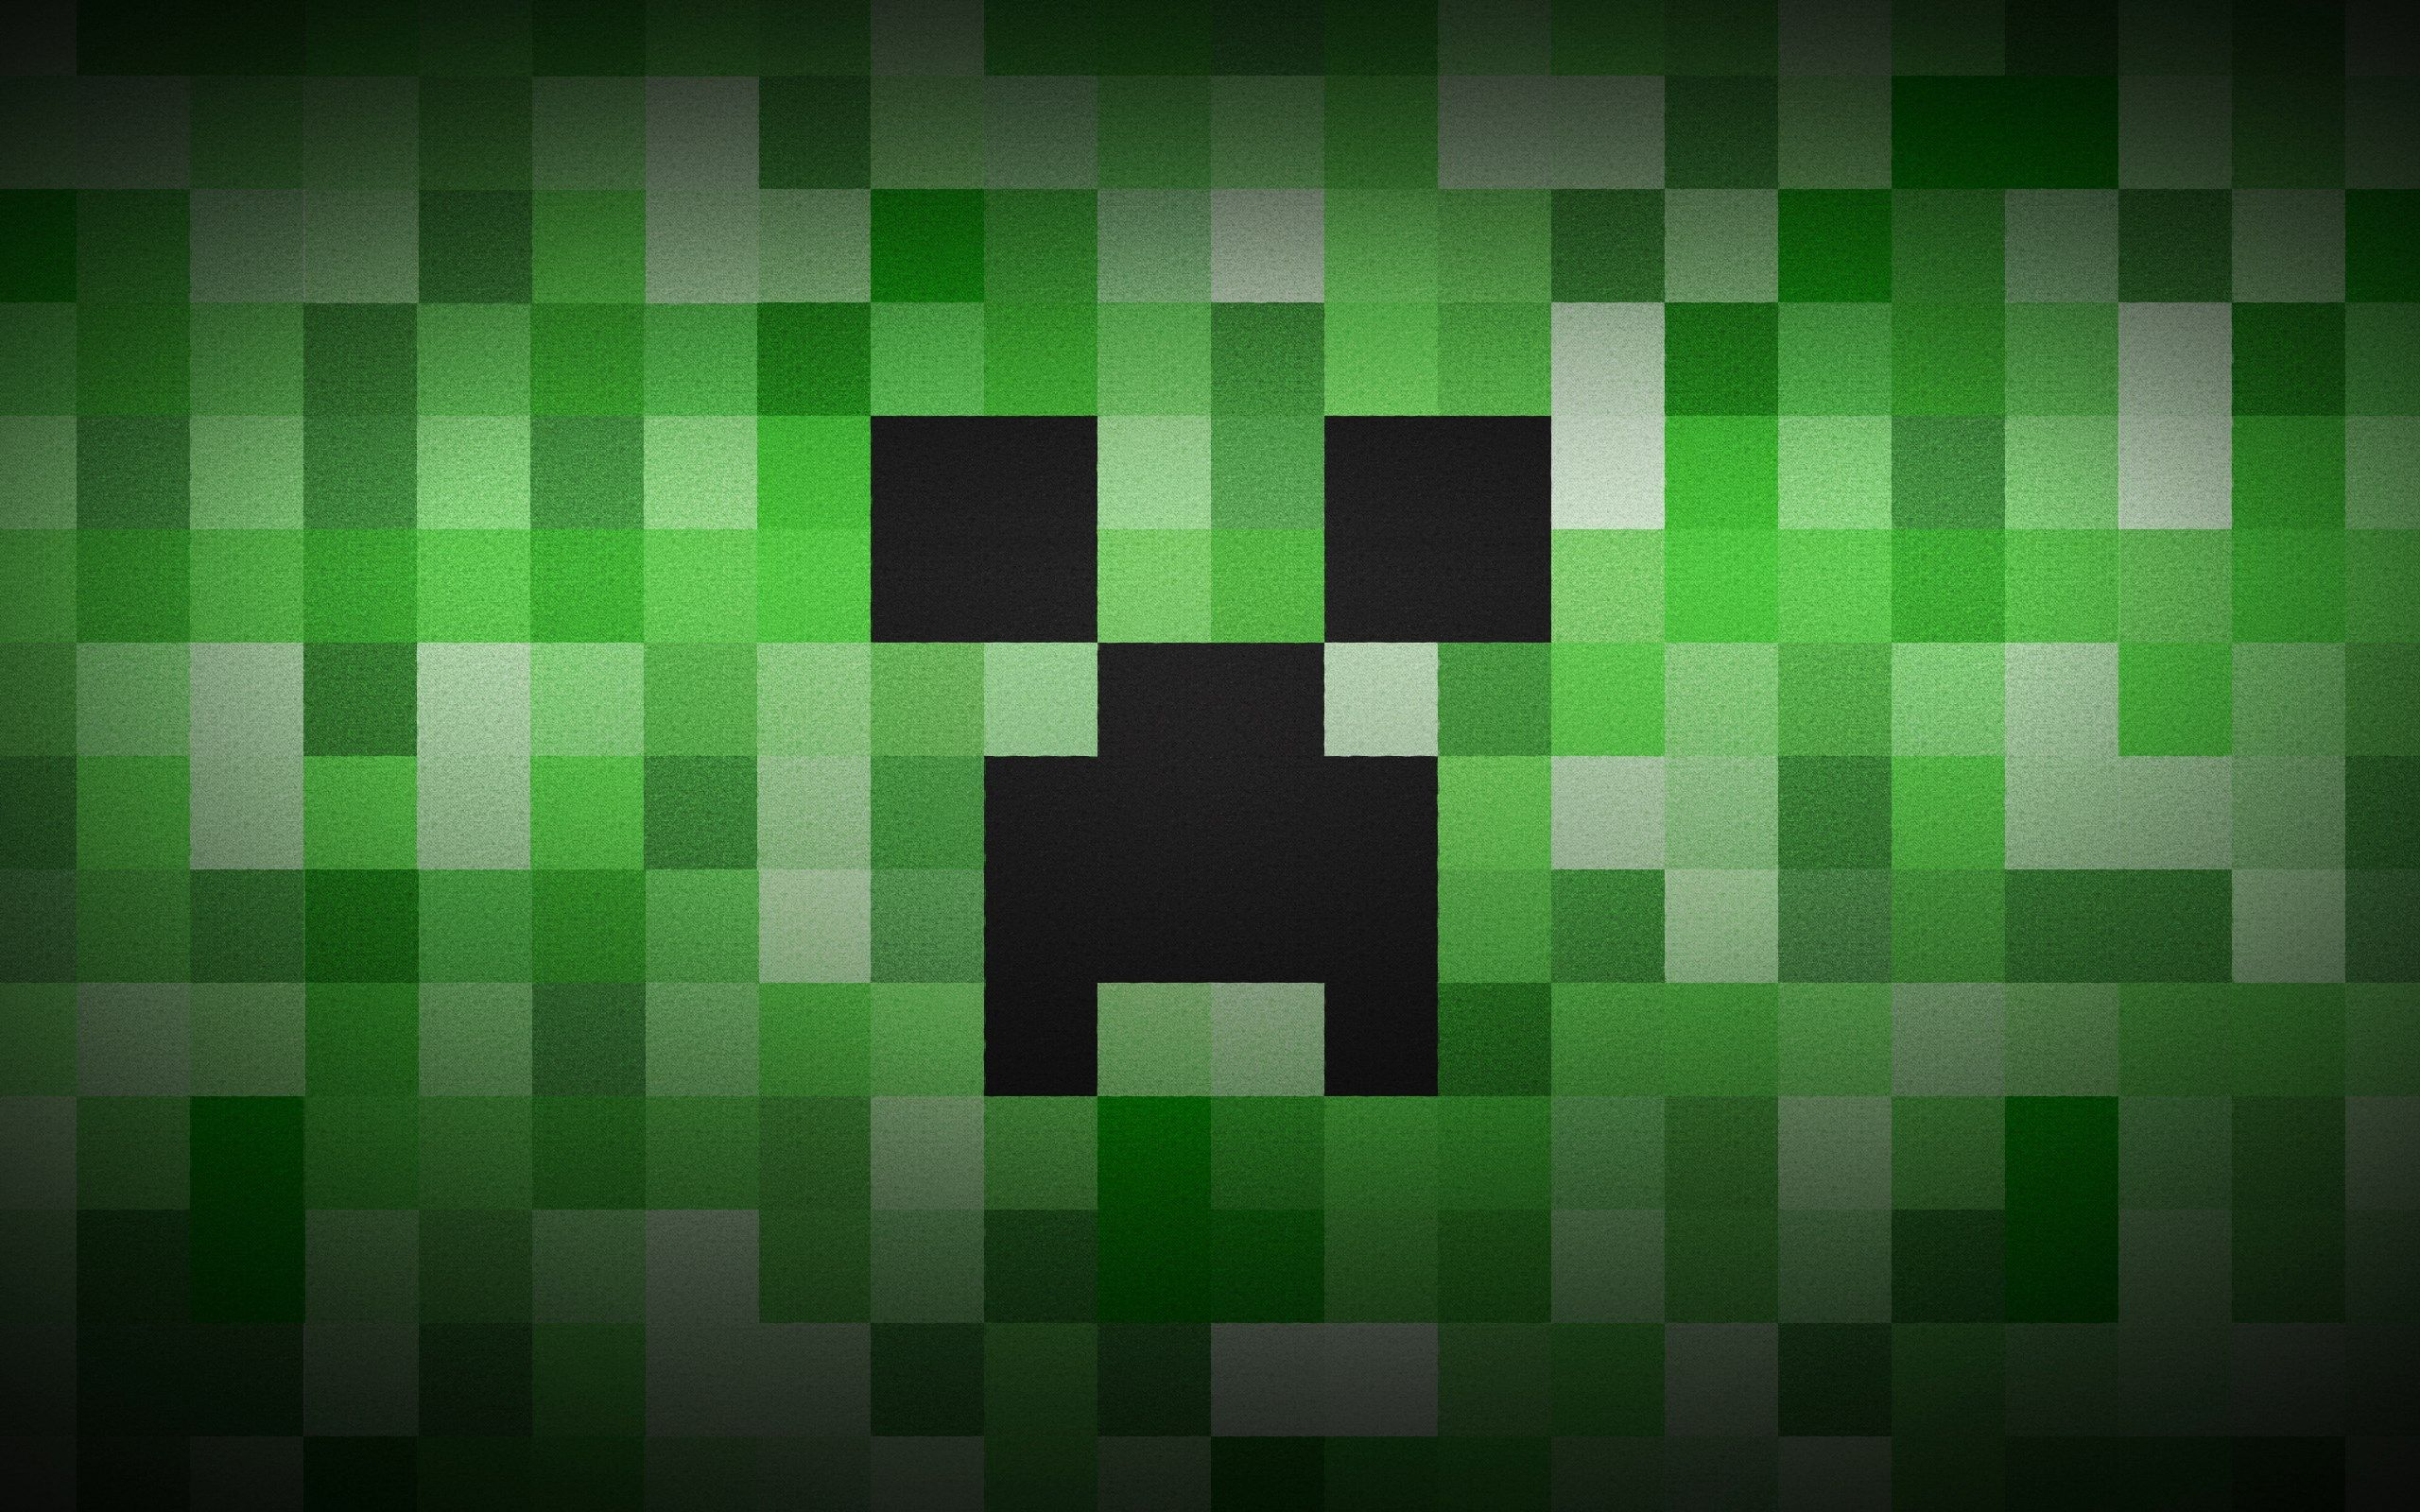 Cool Wallpaper Minecraft Zombie Pigman - 80024d4cfe223c3b668b9caa07244830  Snapshot_386018.jpg